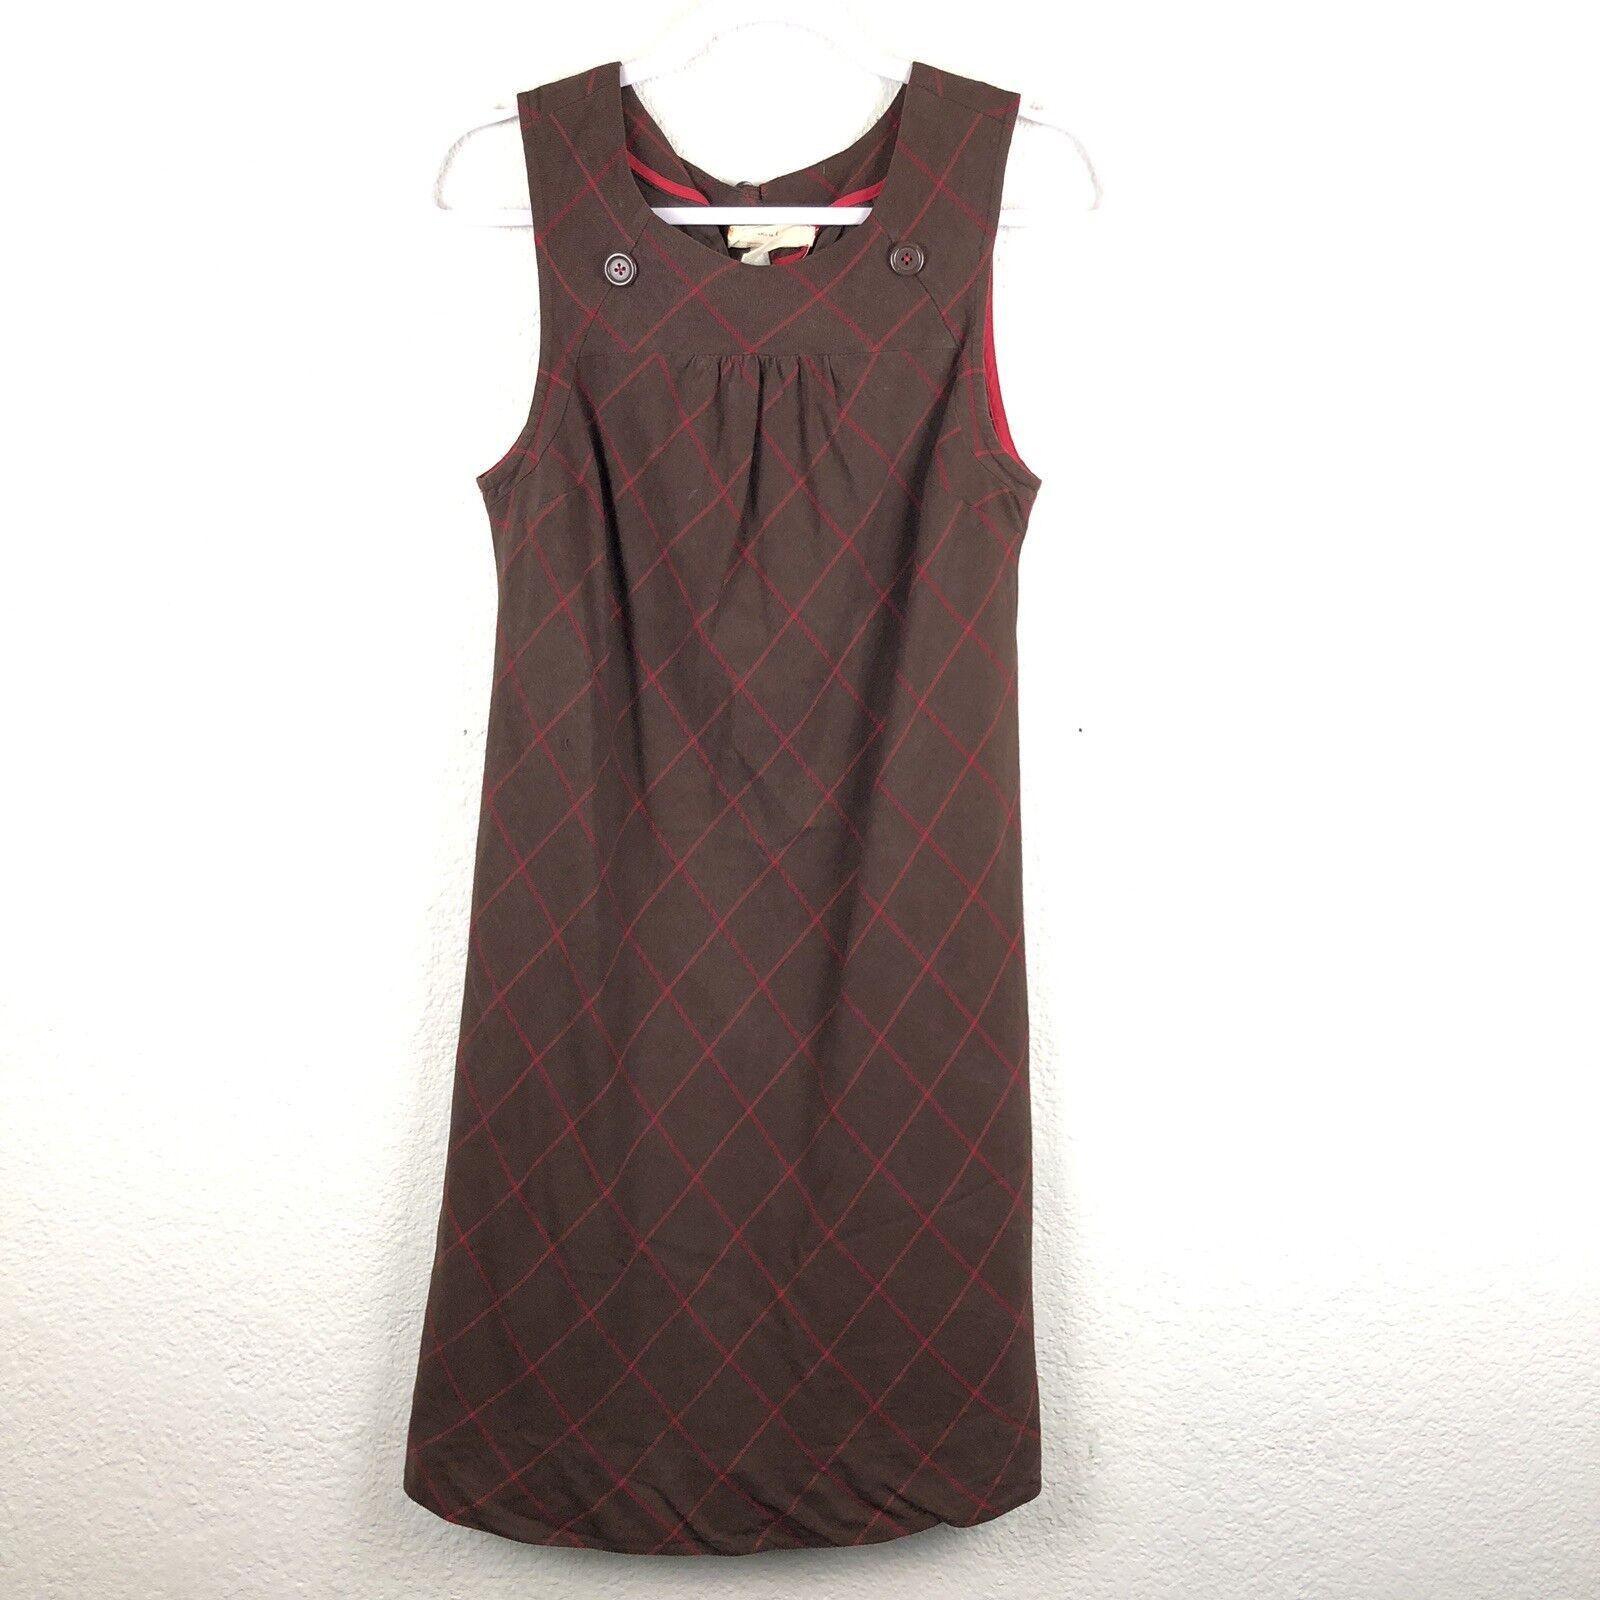 Maeve damen dress Größe 8 Sheath Anthropology 53% Silk Rare Times Table BSK